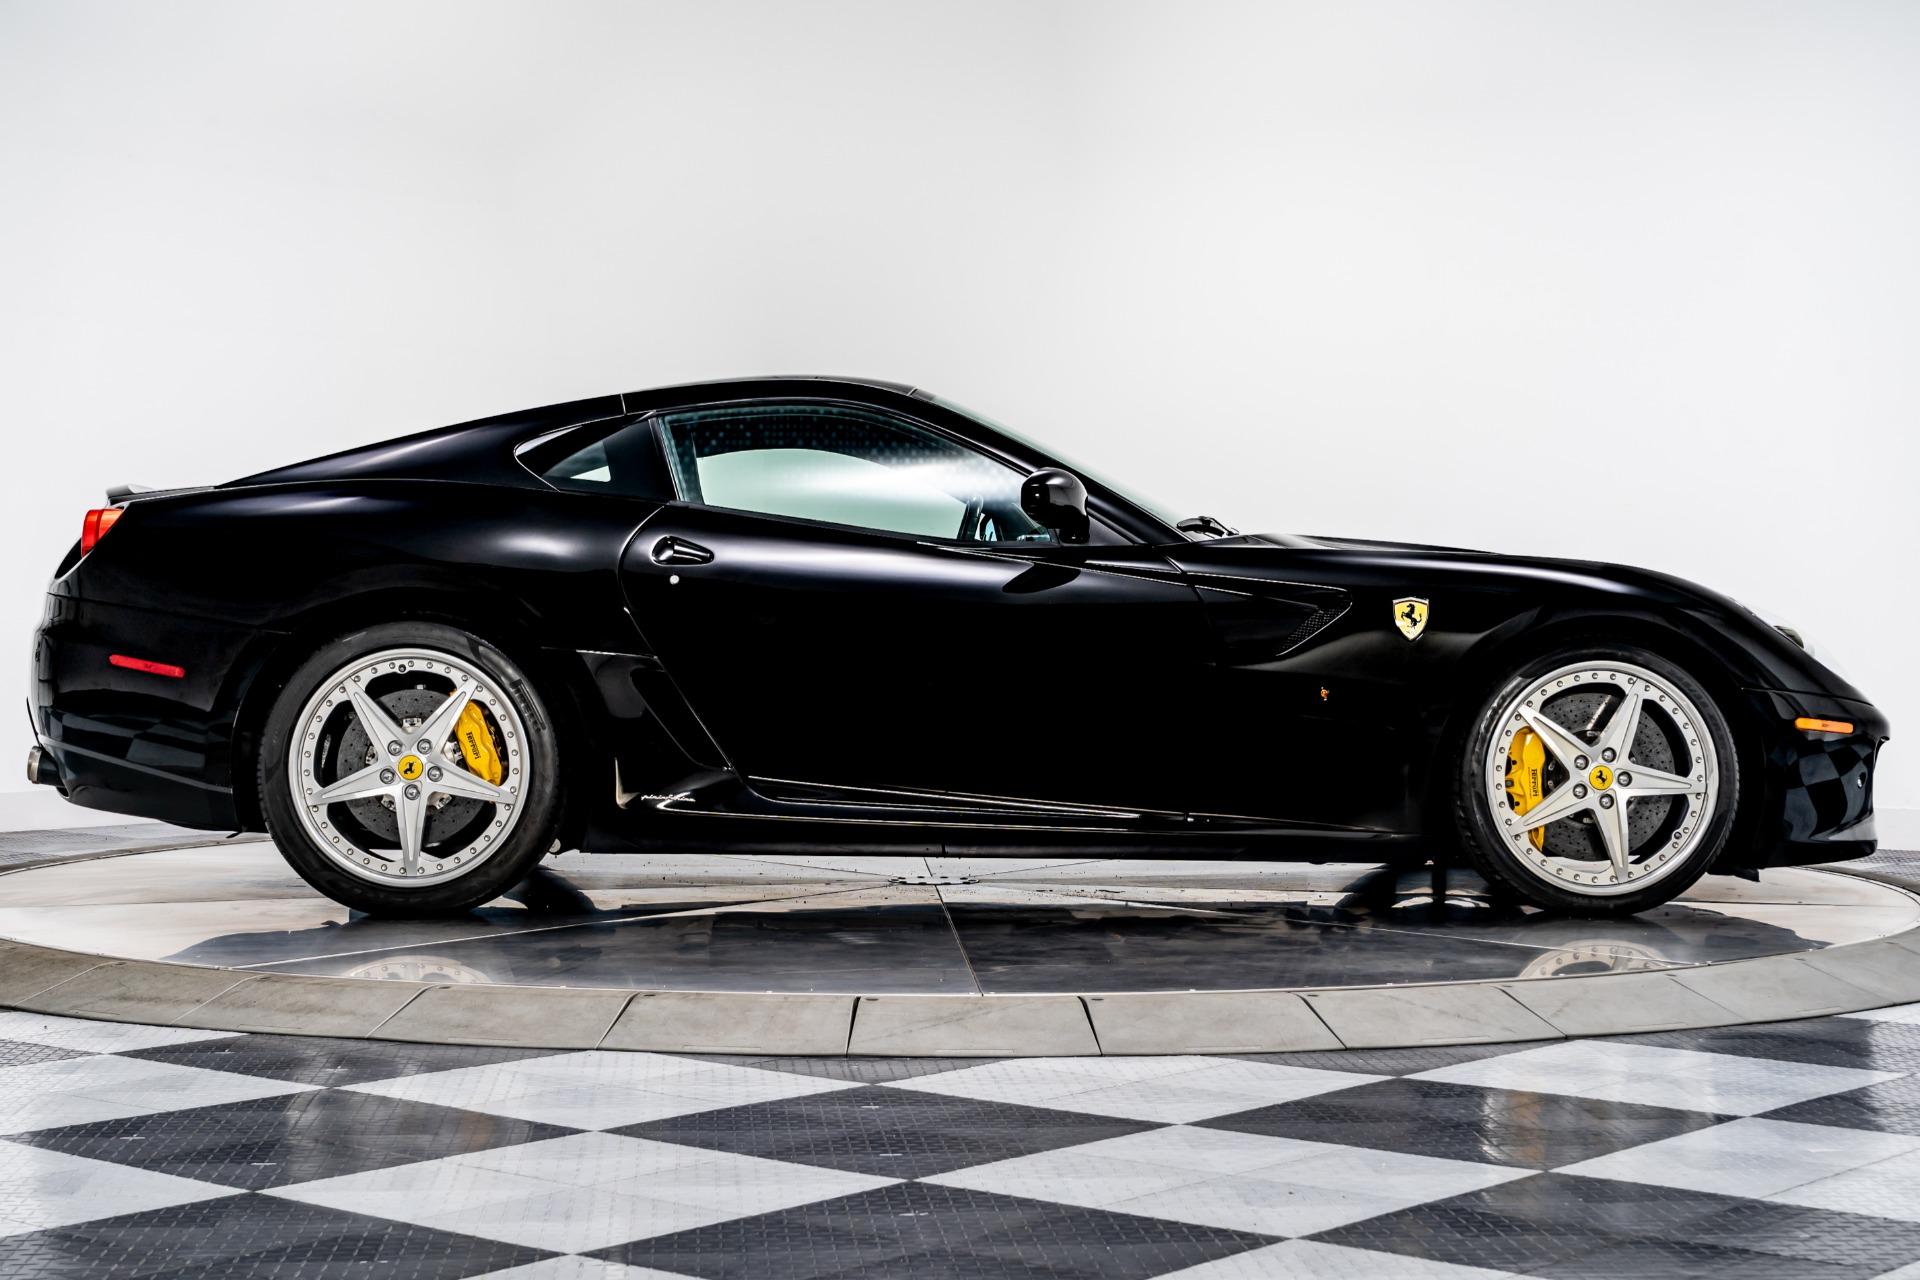 Used 2010 Ferrari 599 Gtb Fiorano Hgte For Sale Sold Marshall Goldman Beverly Hills Stock W20904